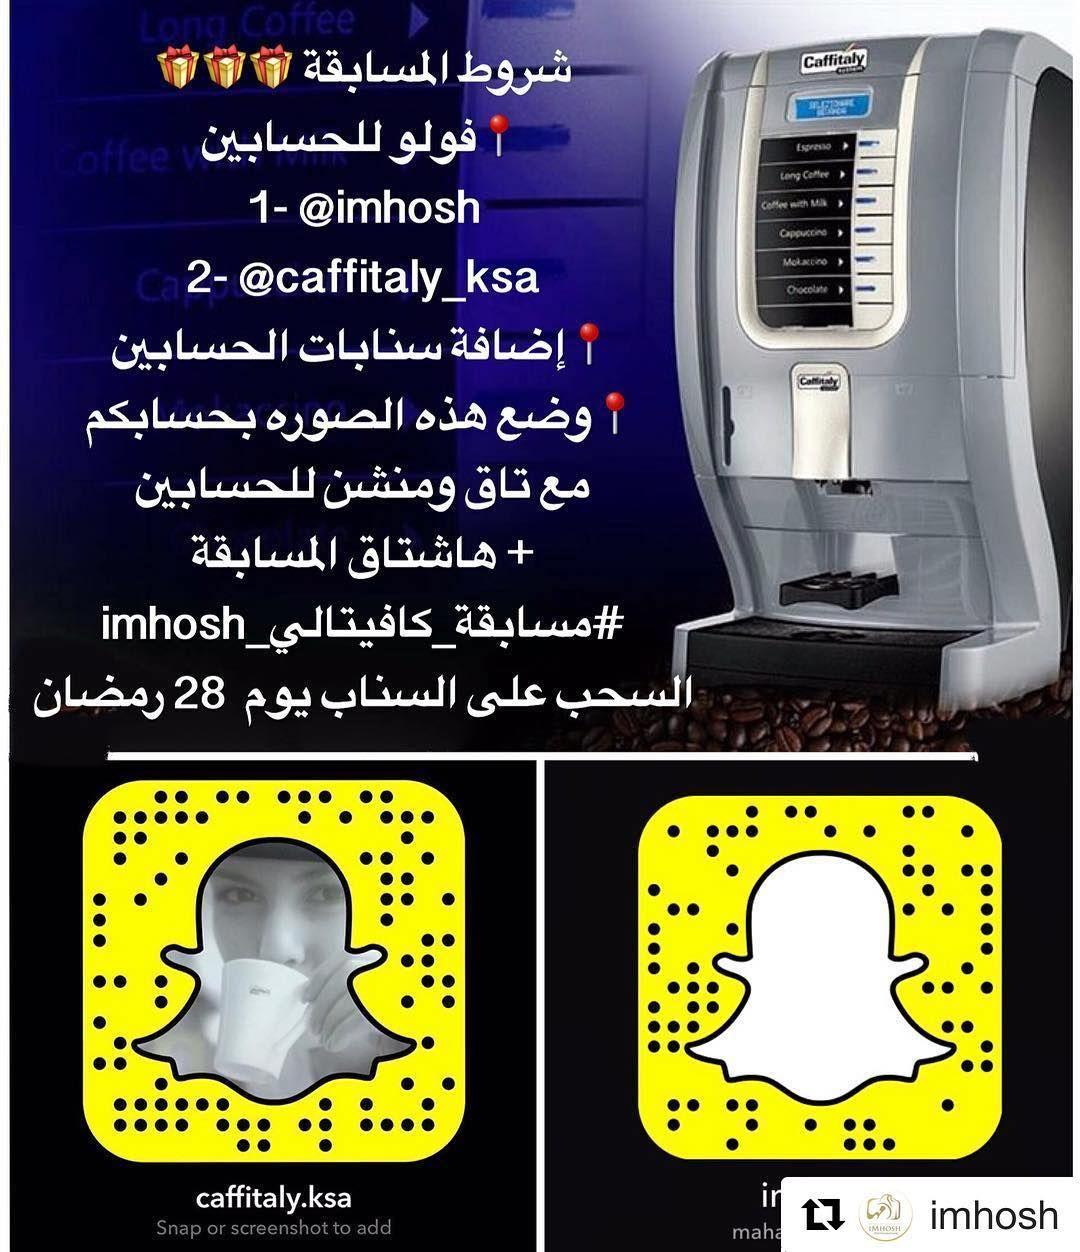 Instagram Photo By كــافـيـتـالــي Jun 26 2016 At 3 44am Utc Instagram Posts Pay Phone Instagram